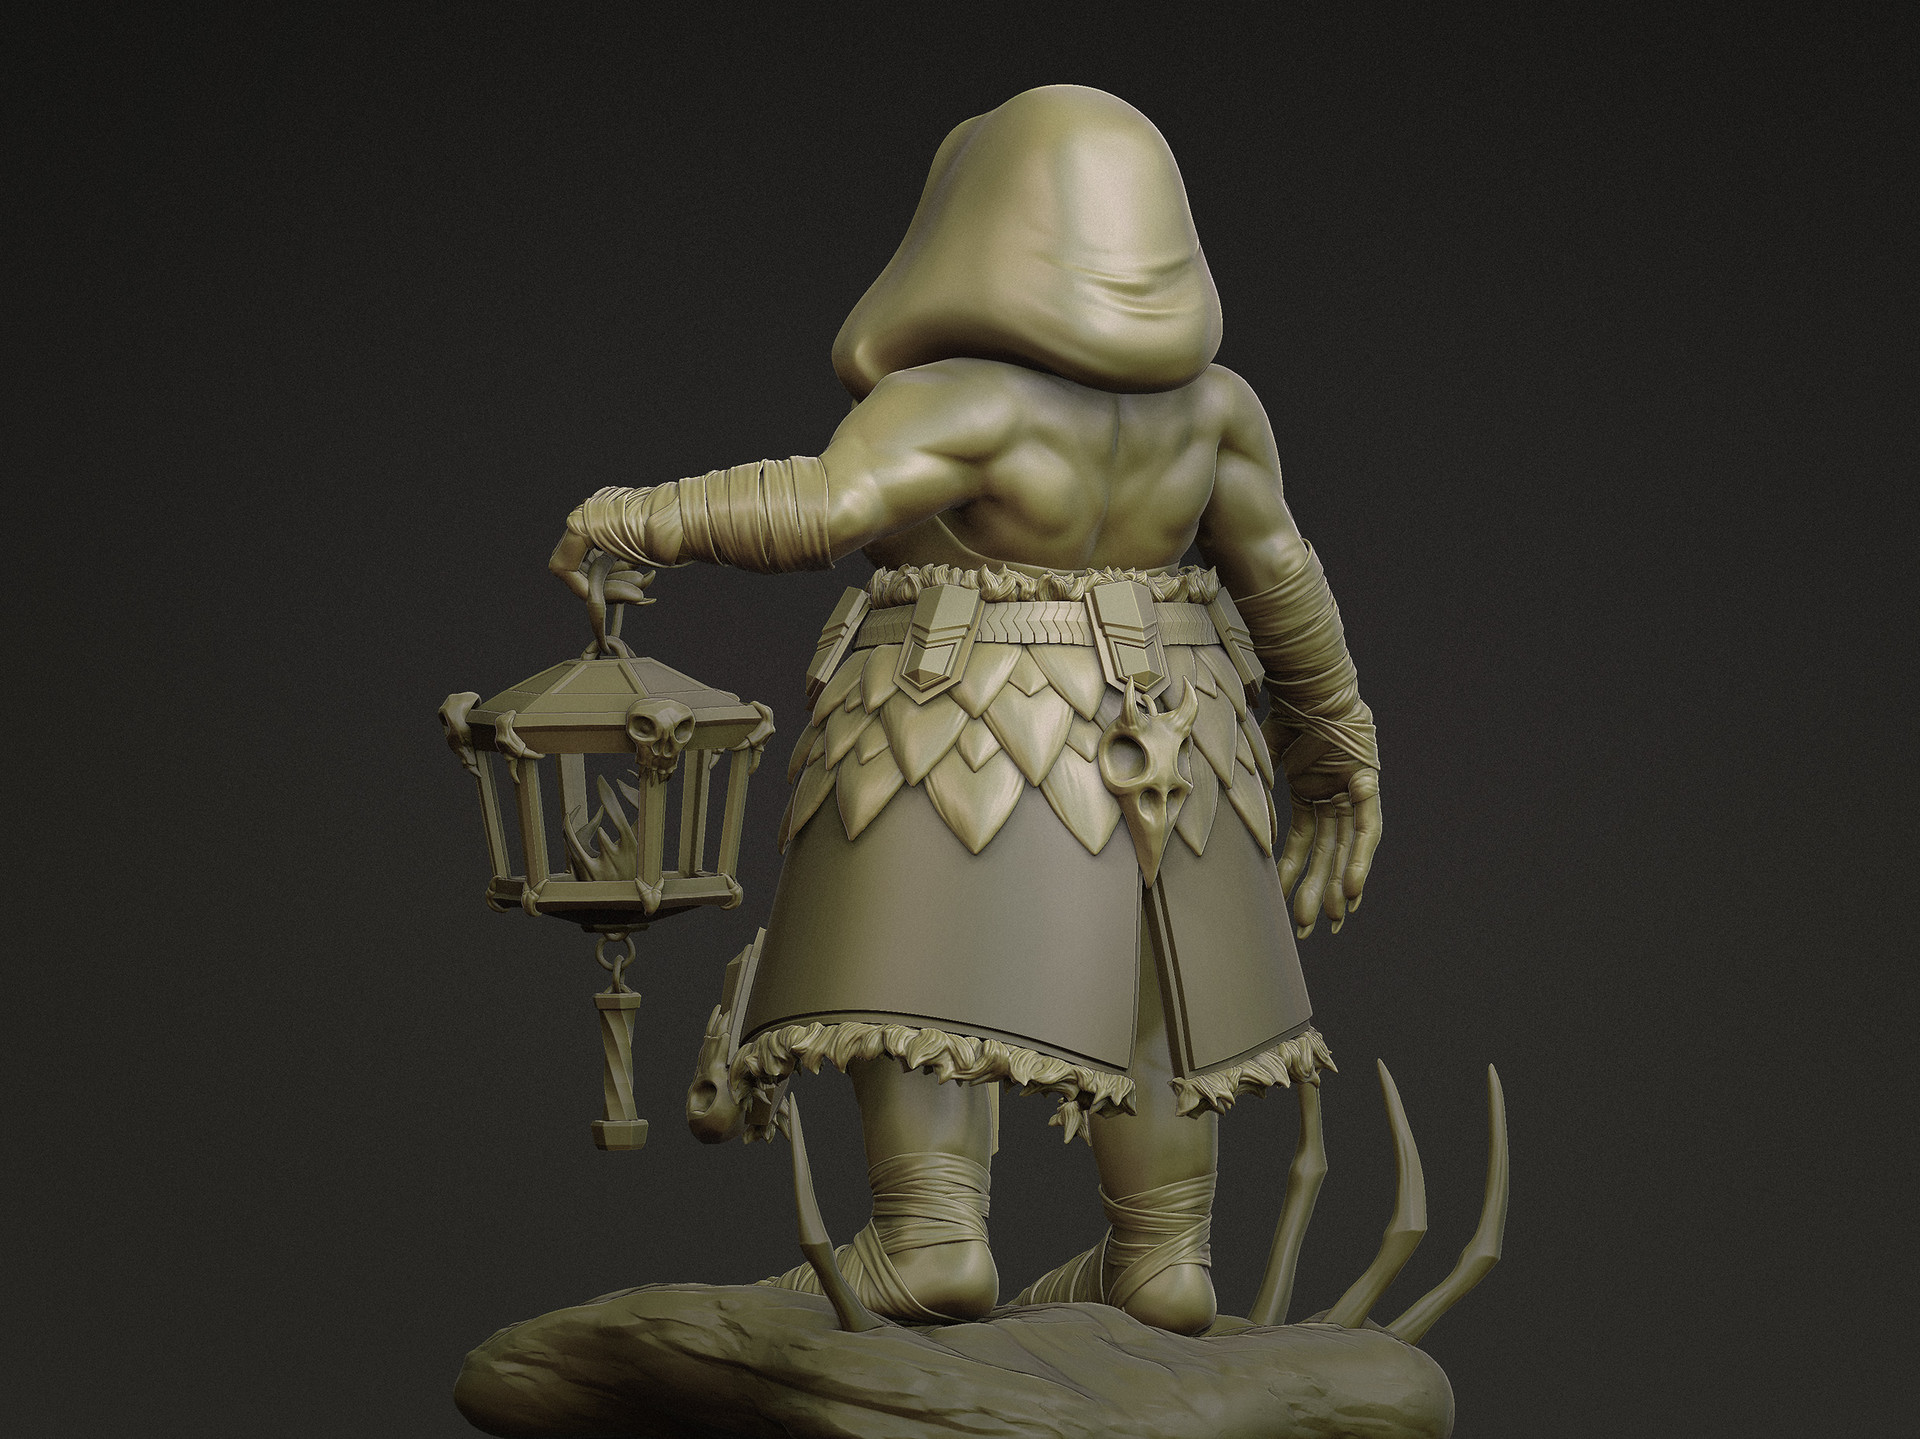 Rikke jansen dwarf sculpt fin back